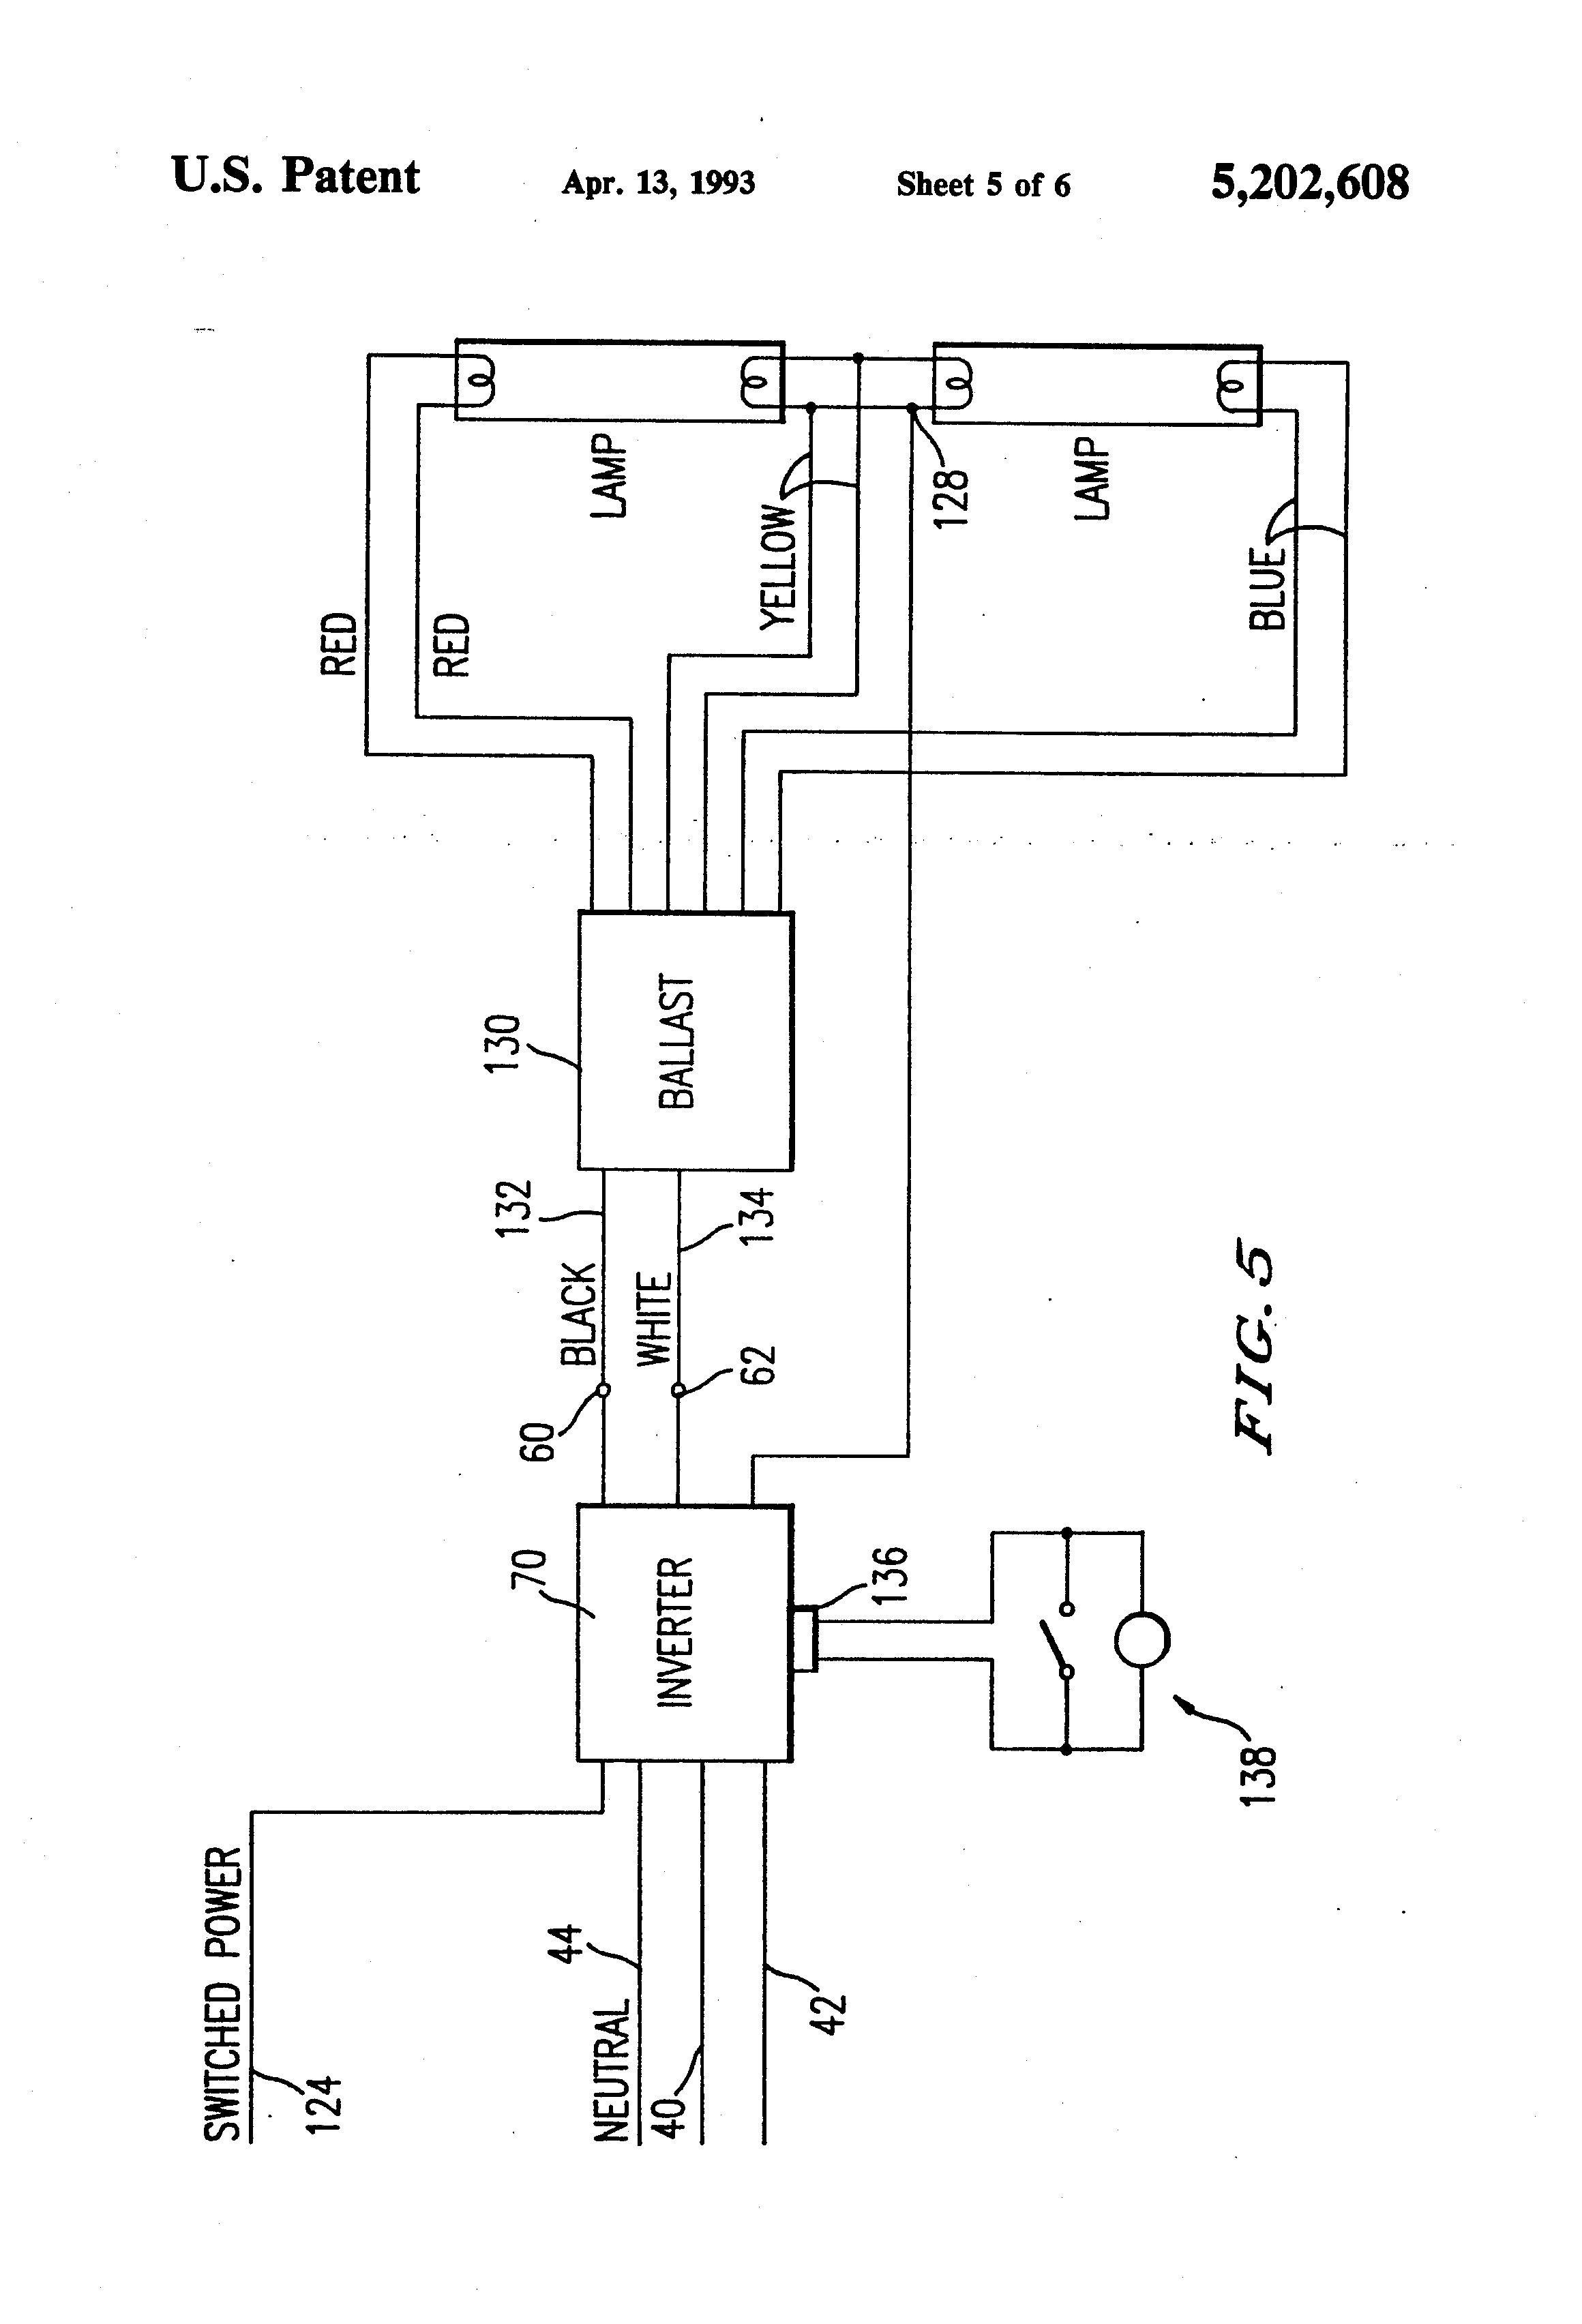 4 Lamp T8 Ballast Wiring Diagram - Mikulskilawoffices - 4 Lamp T8 Ballast Wiring Diagram